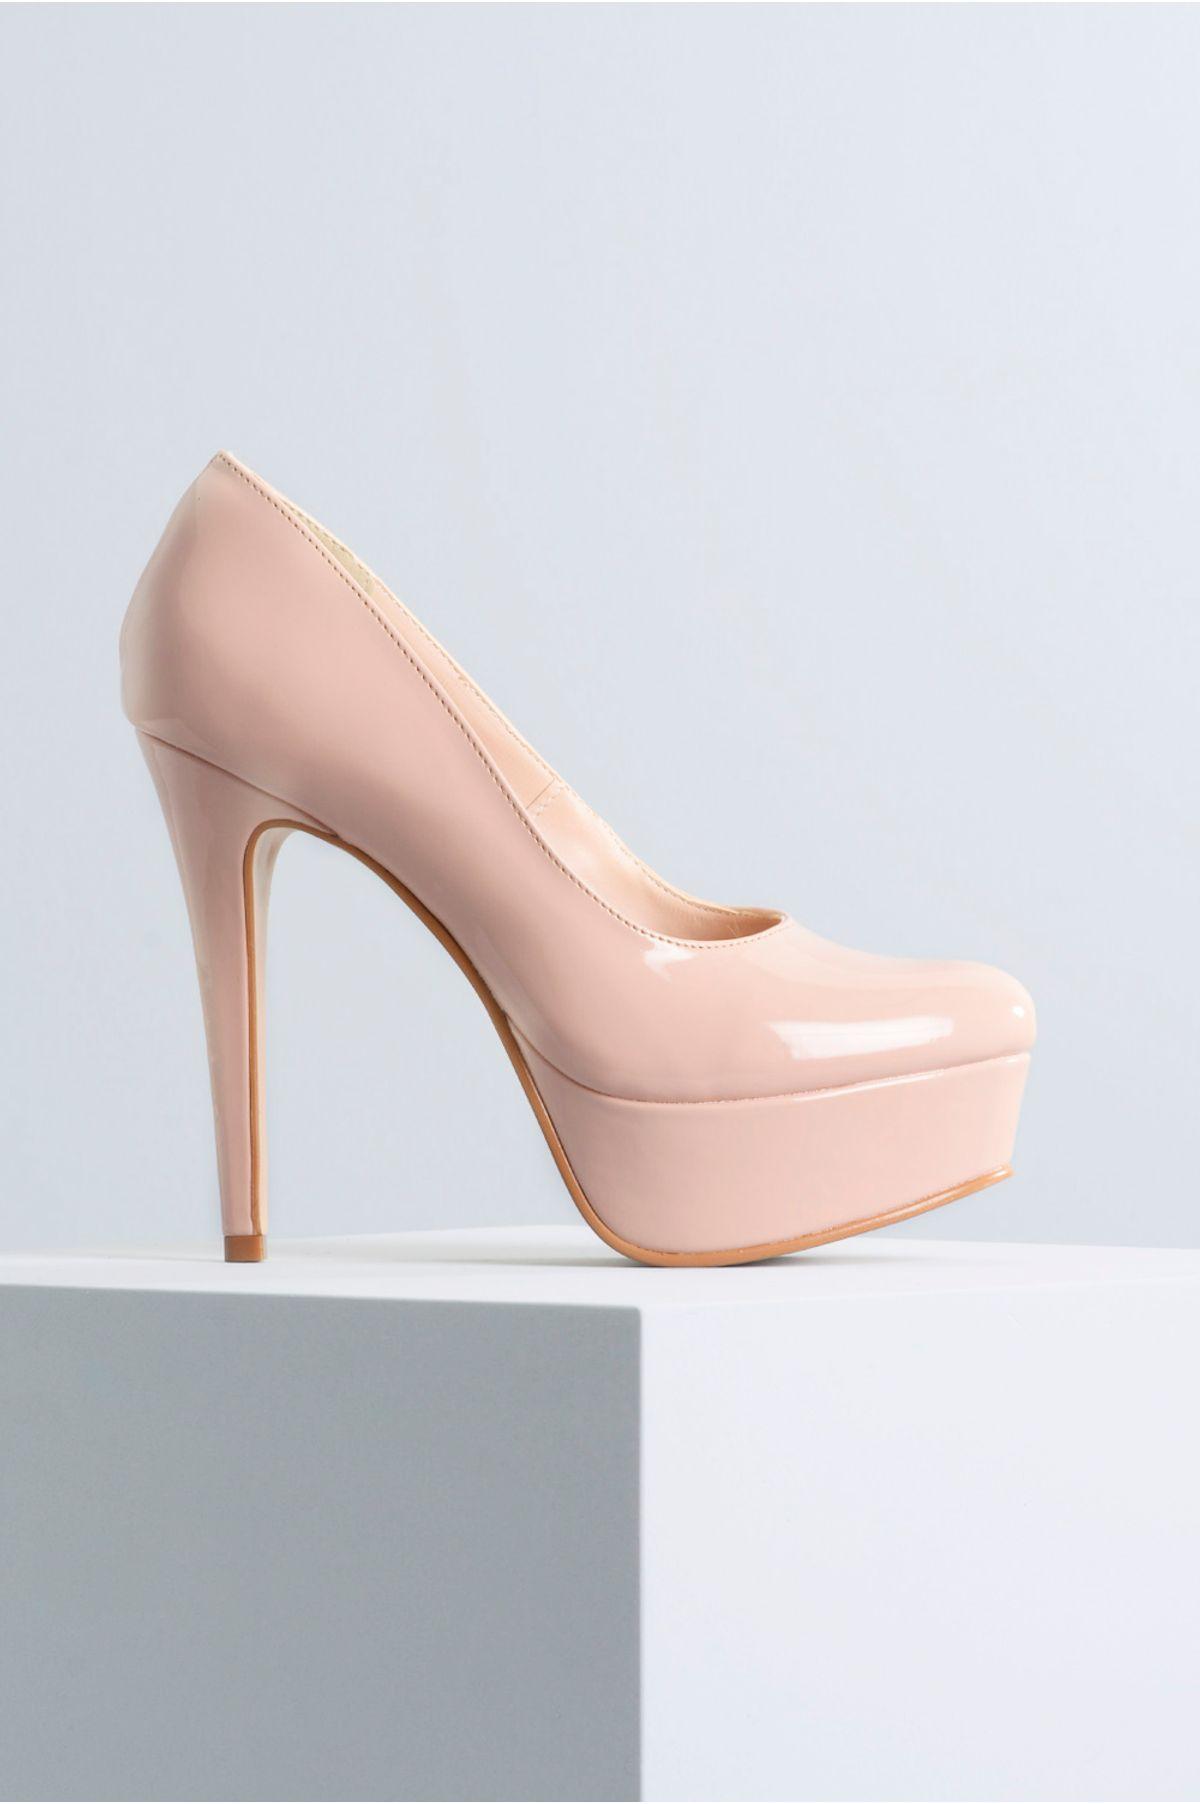 9665cfc741 Sapato Feminino Salto Alto Lone Mundial VERNIZ - NATURAL - Mundial ...